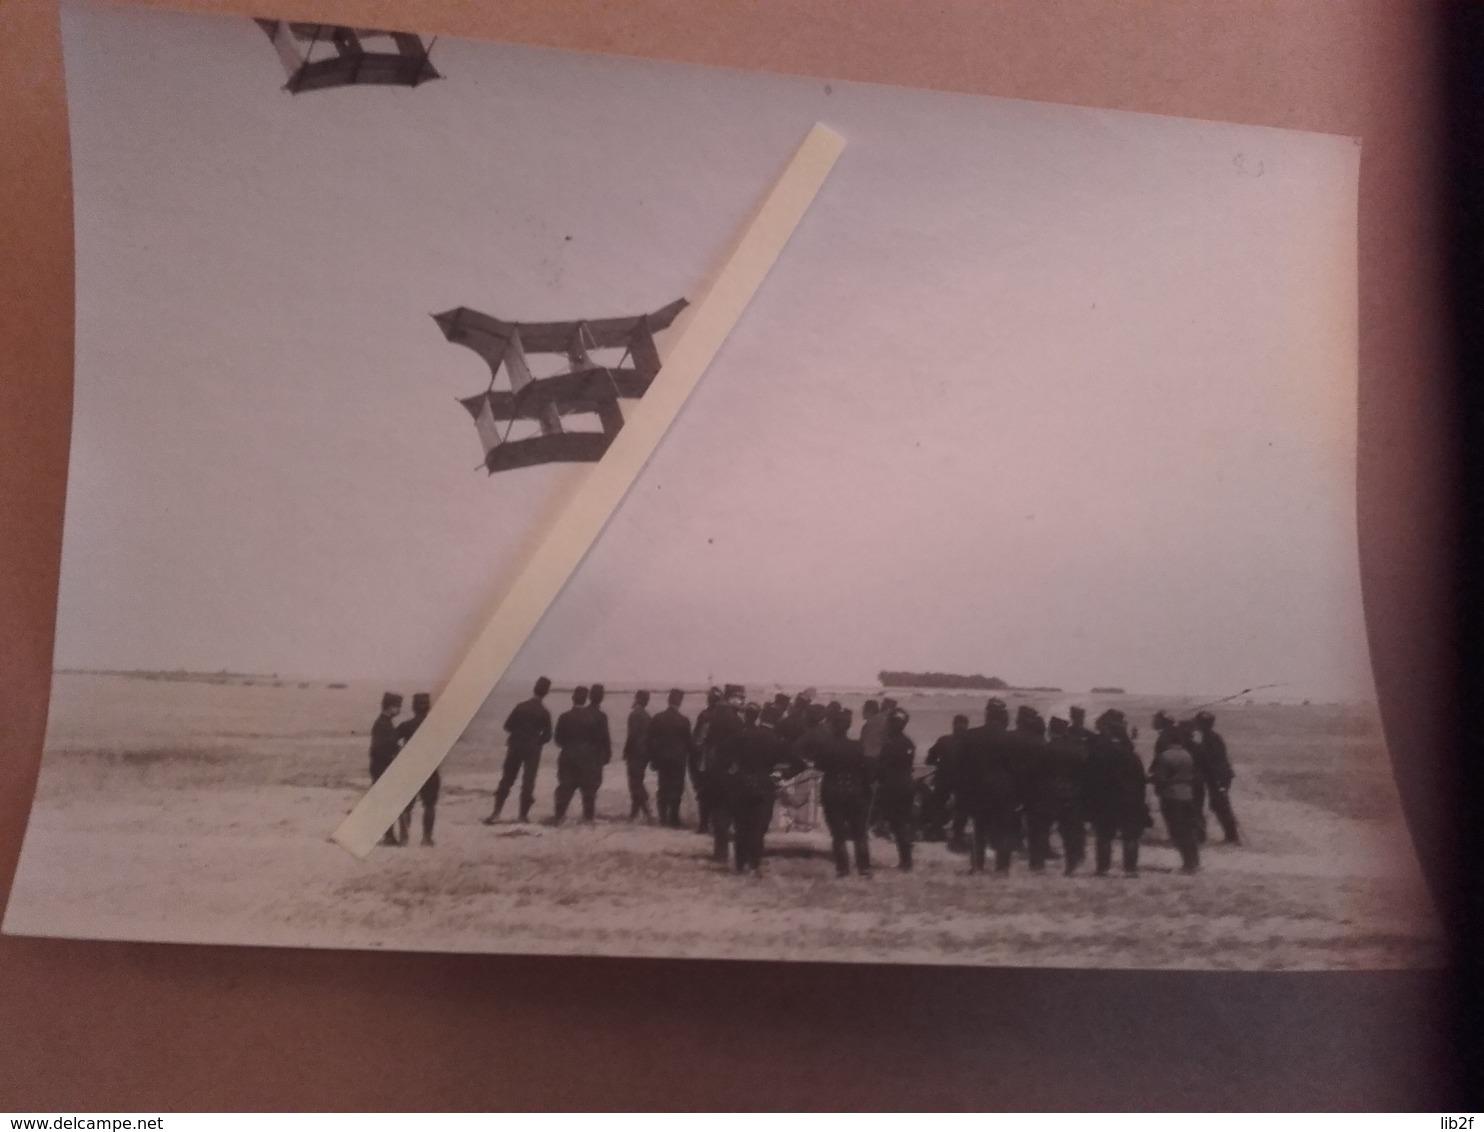 1914 Aérostation Cerf-volants Ballons Aérostiers Observation Artillerie Poilu Tranchée W1 1914 1918 14-18 - War, Military